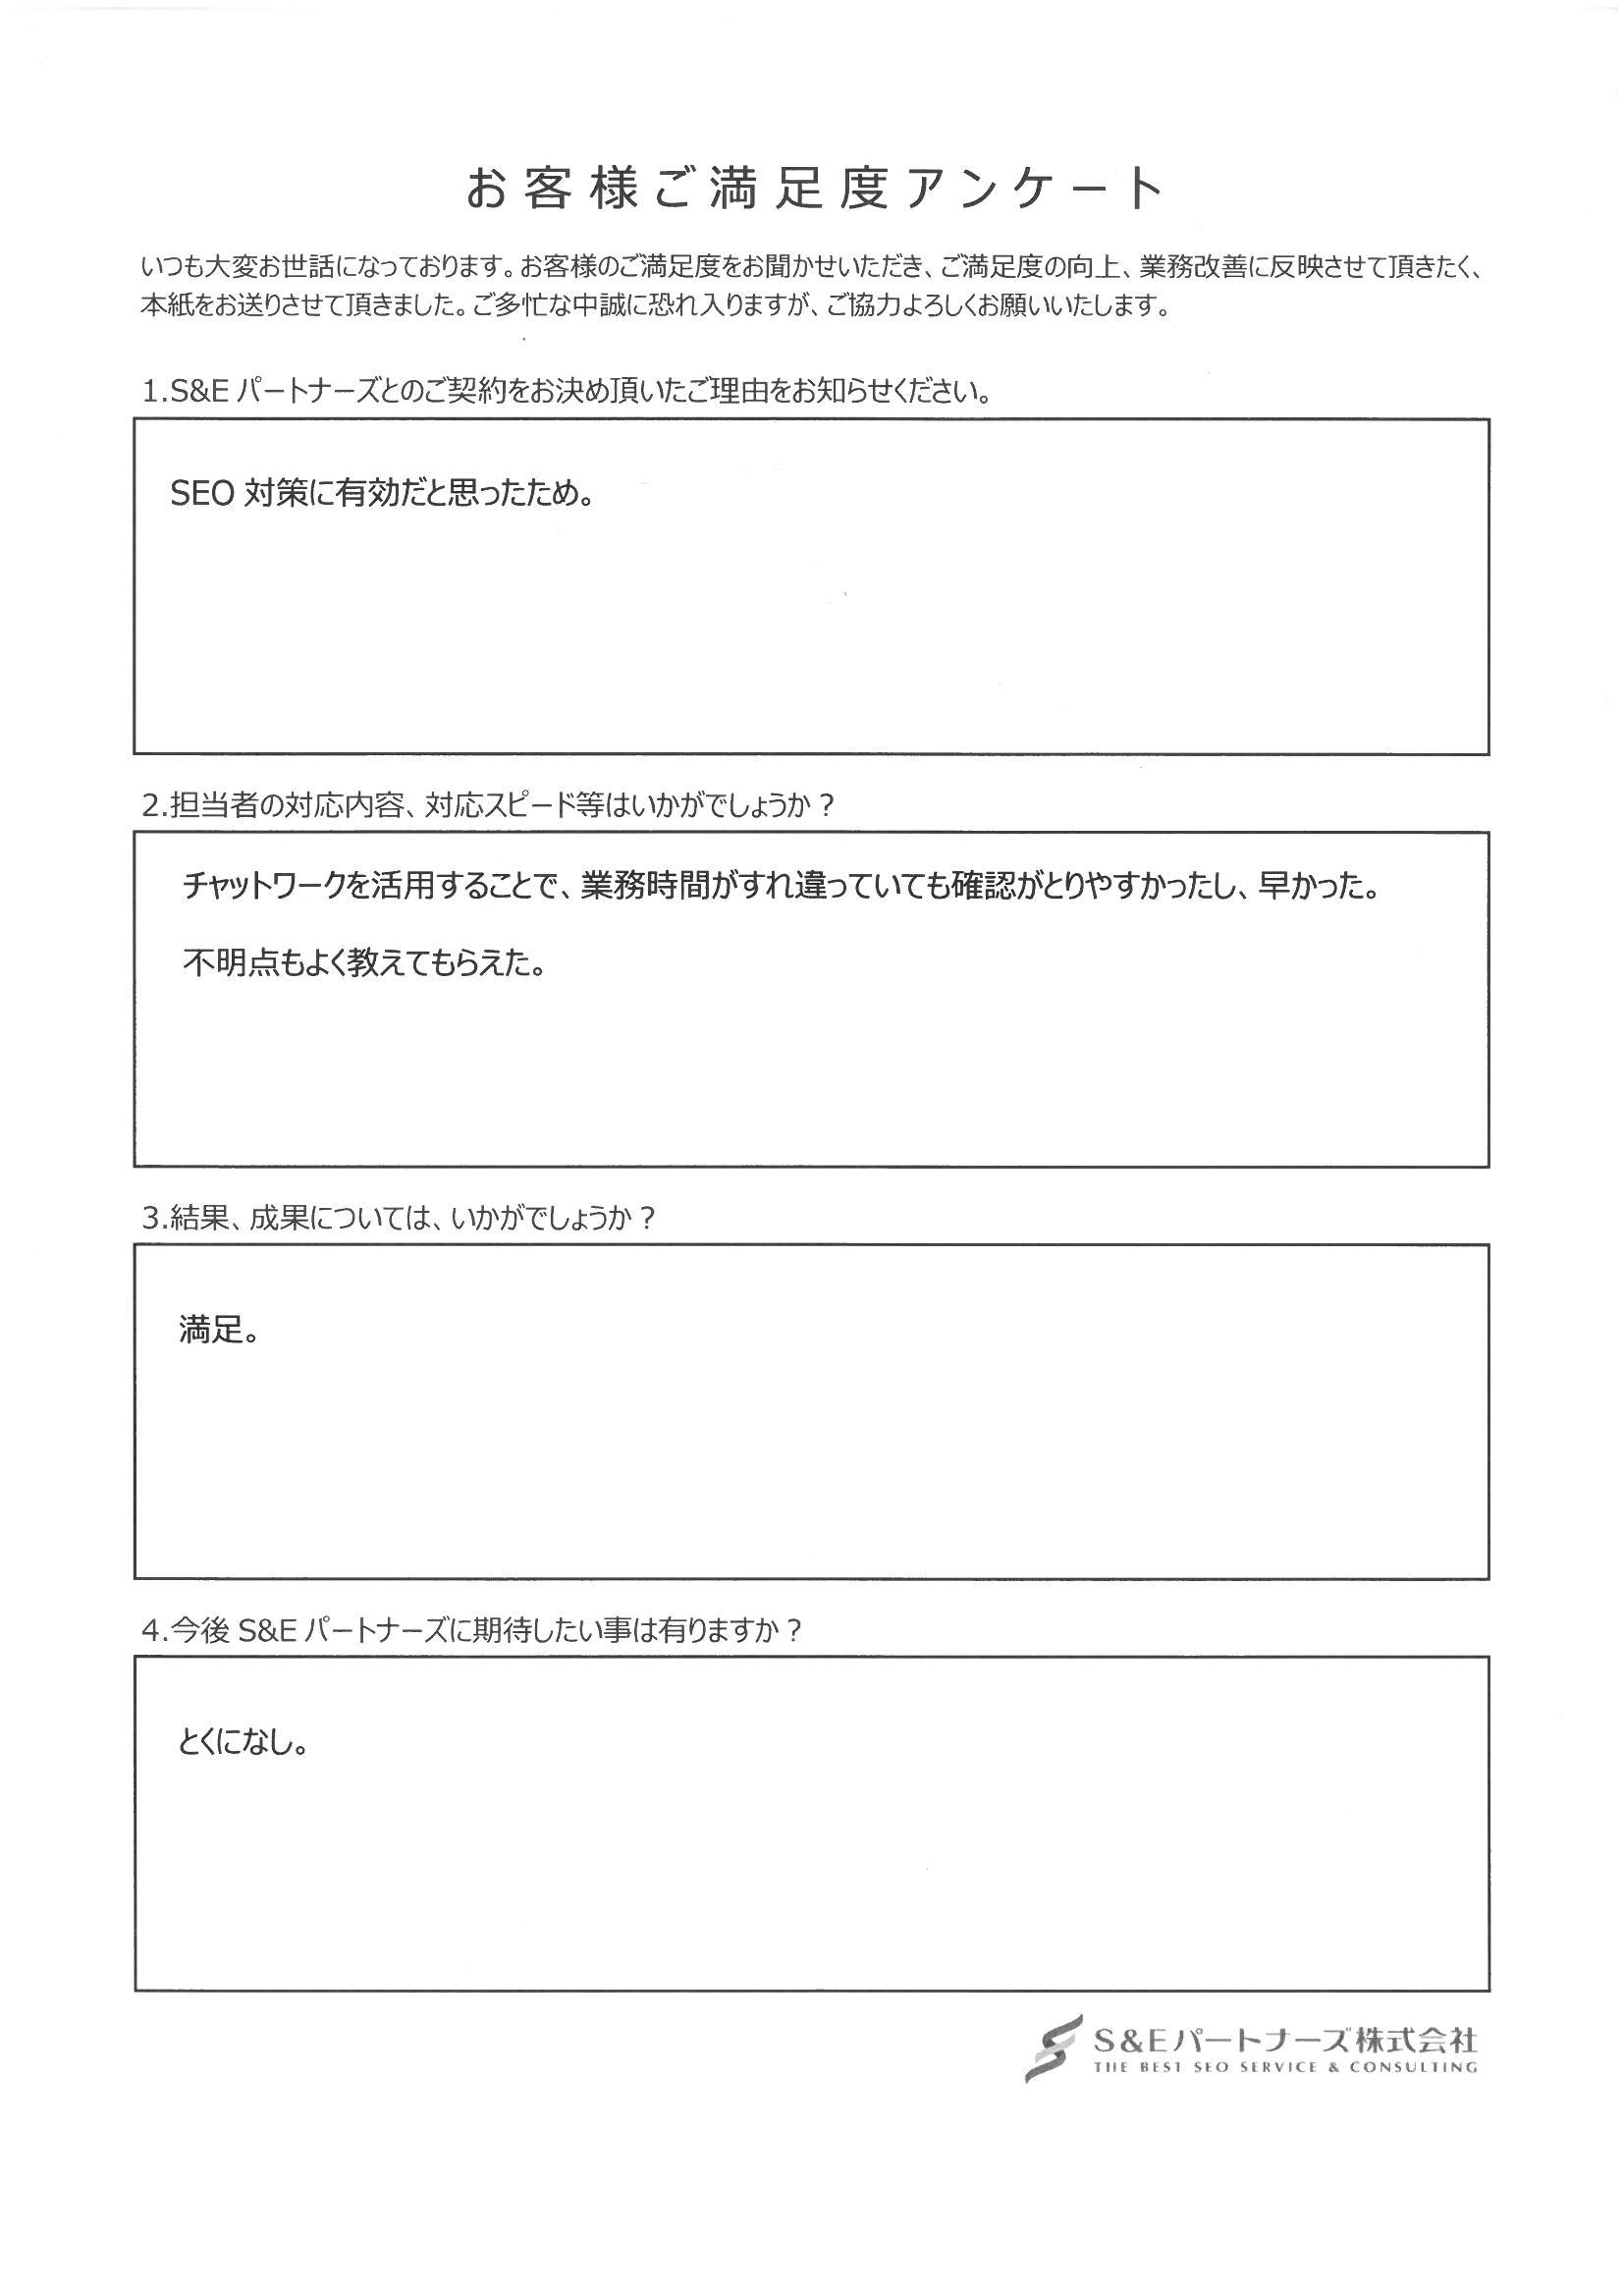 【SEO対策お客様の声】東京都で役員専属運転手事業を運営されているお客様